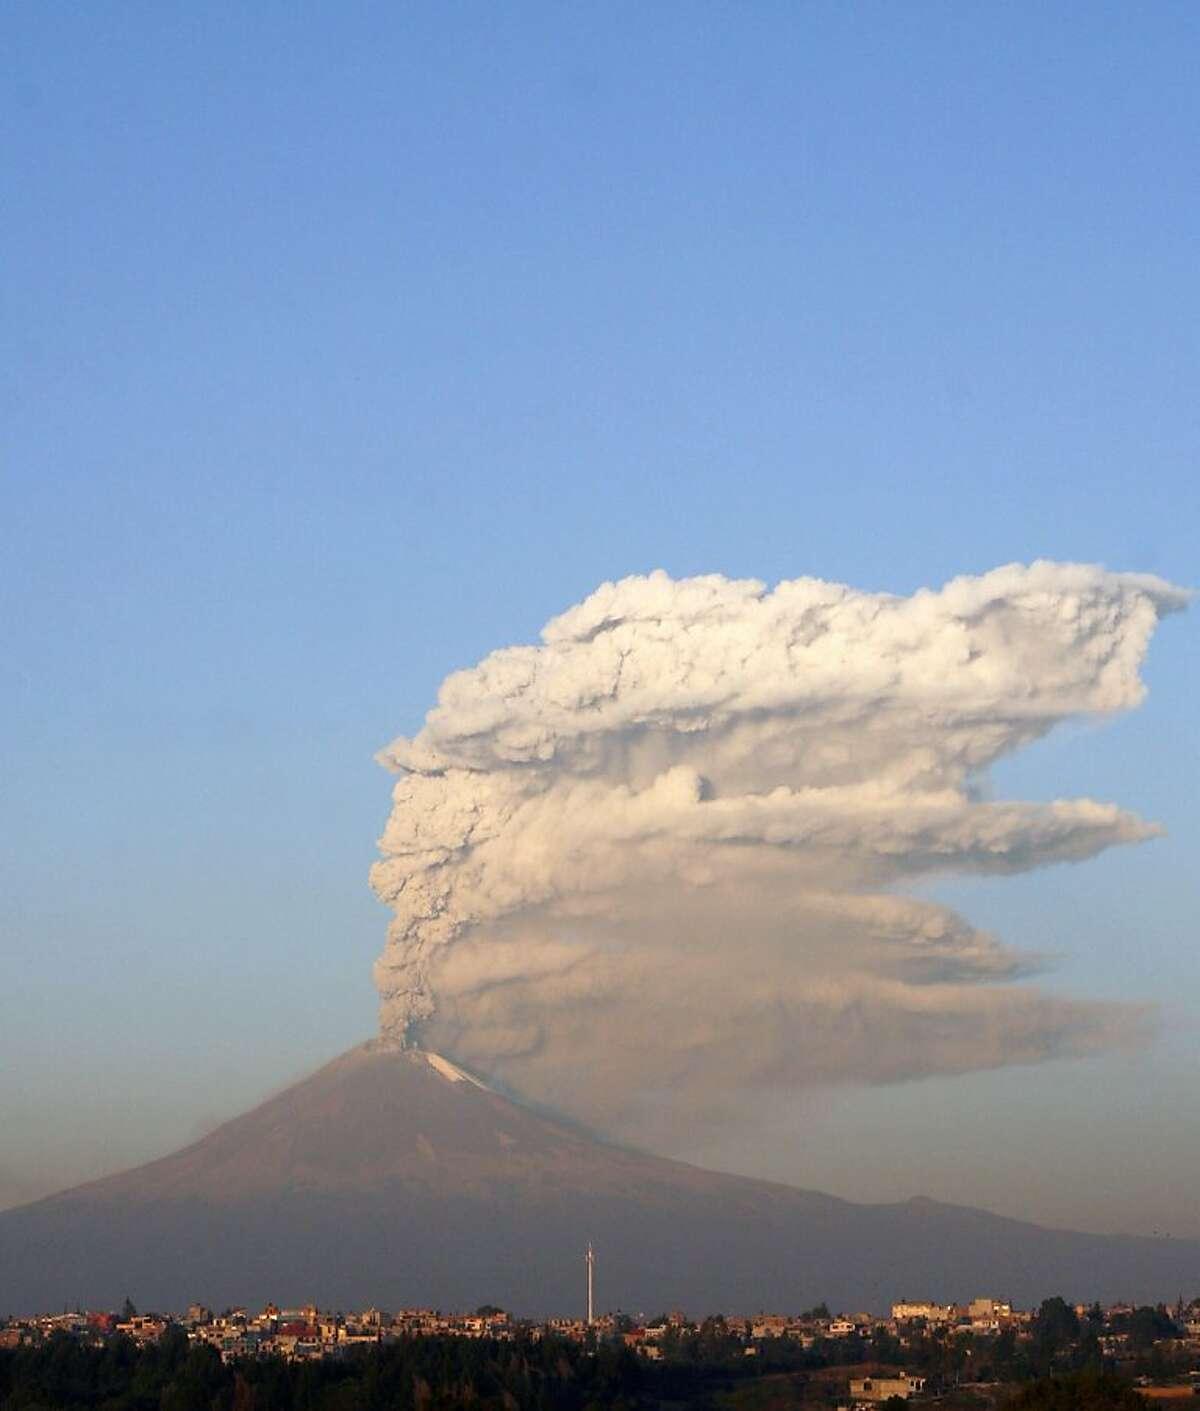 View of the Popocatepetl volcano, near Puebla, Mexico.